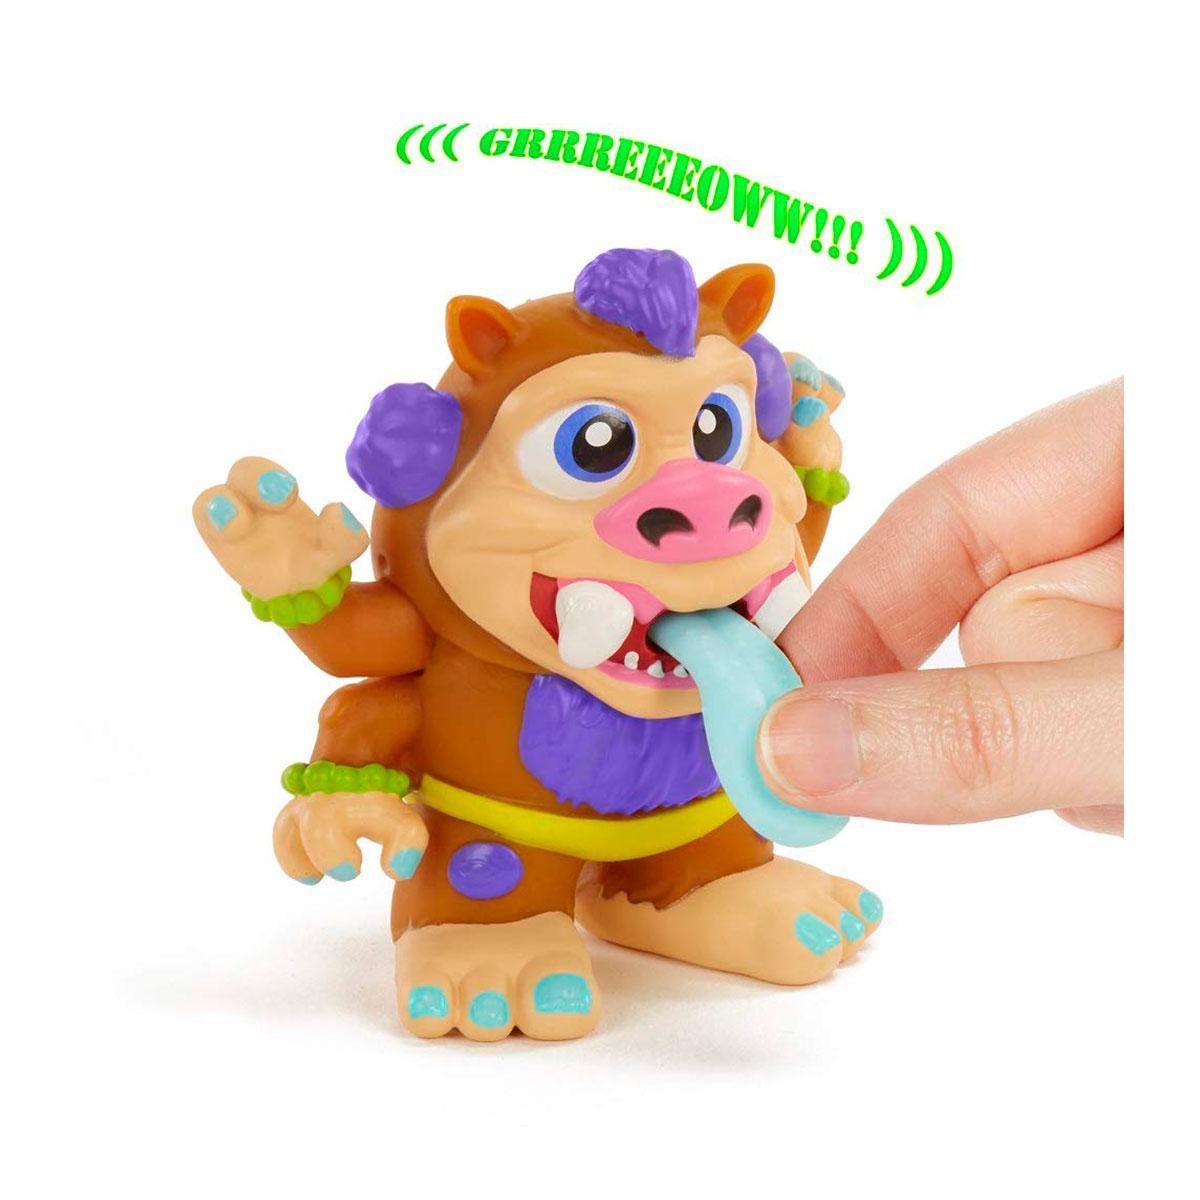 Crate Creatures Surprise! Интерактивная игрушка – серии Flingers Снорт Хог, 551805-SN